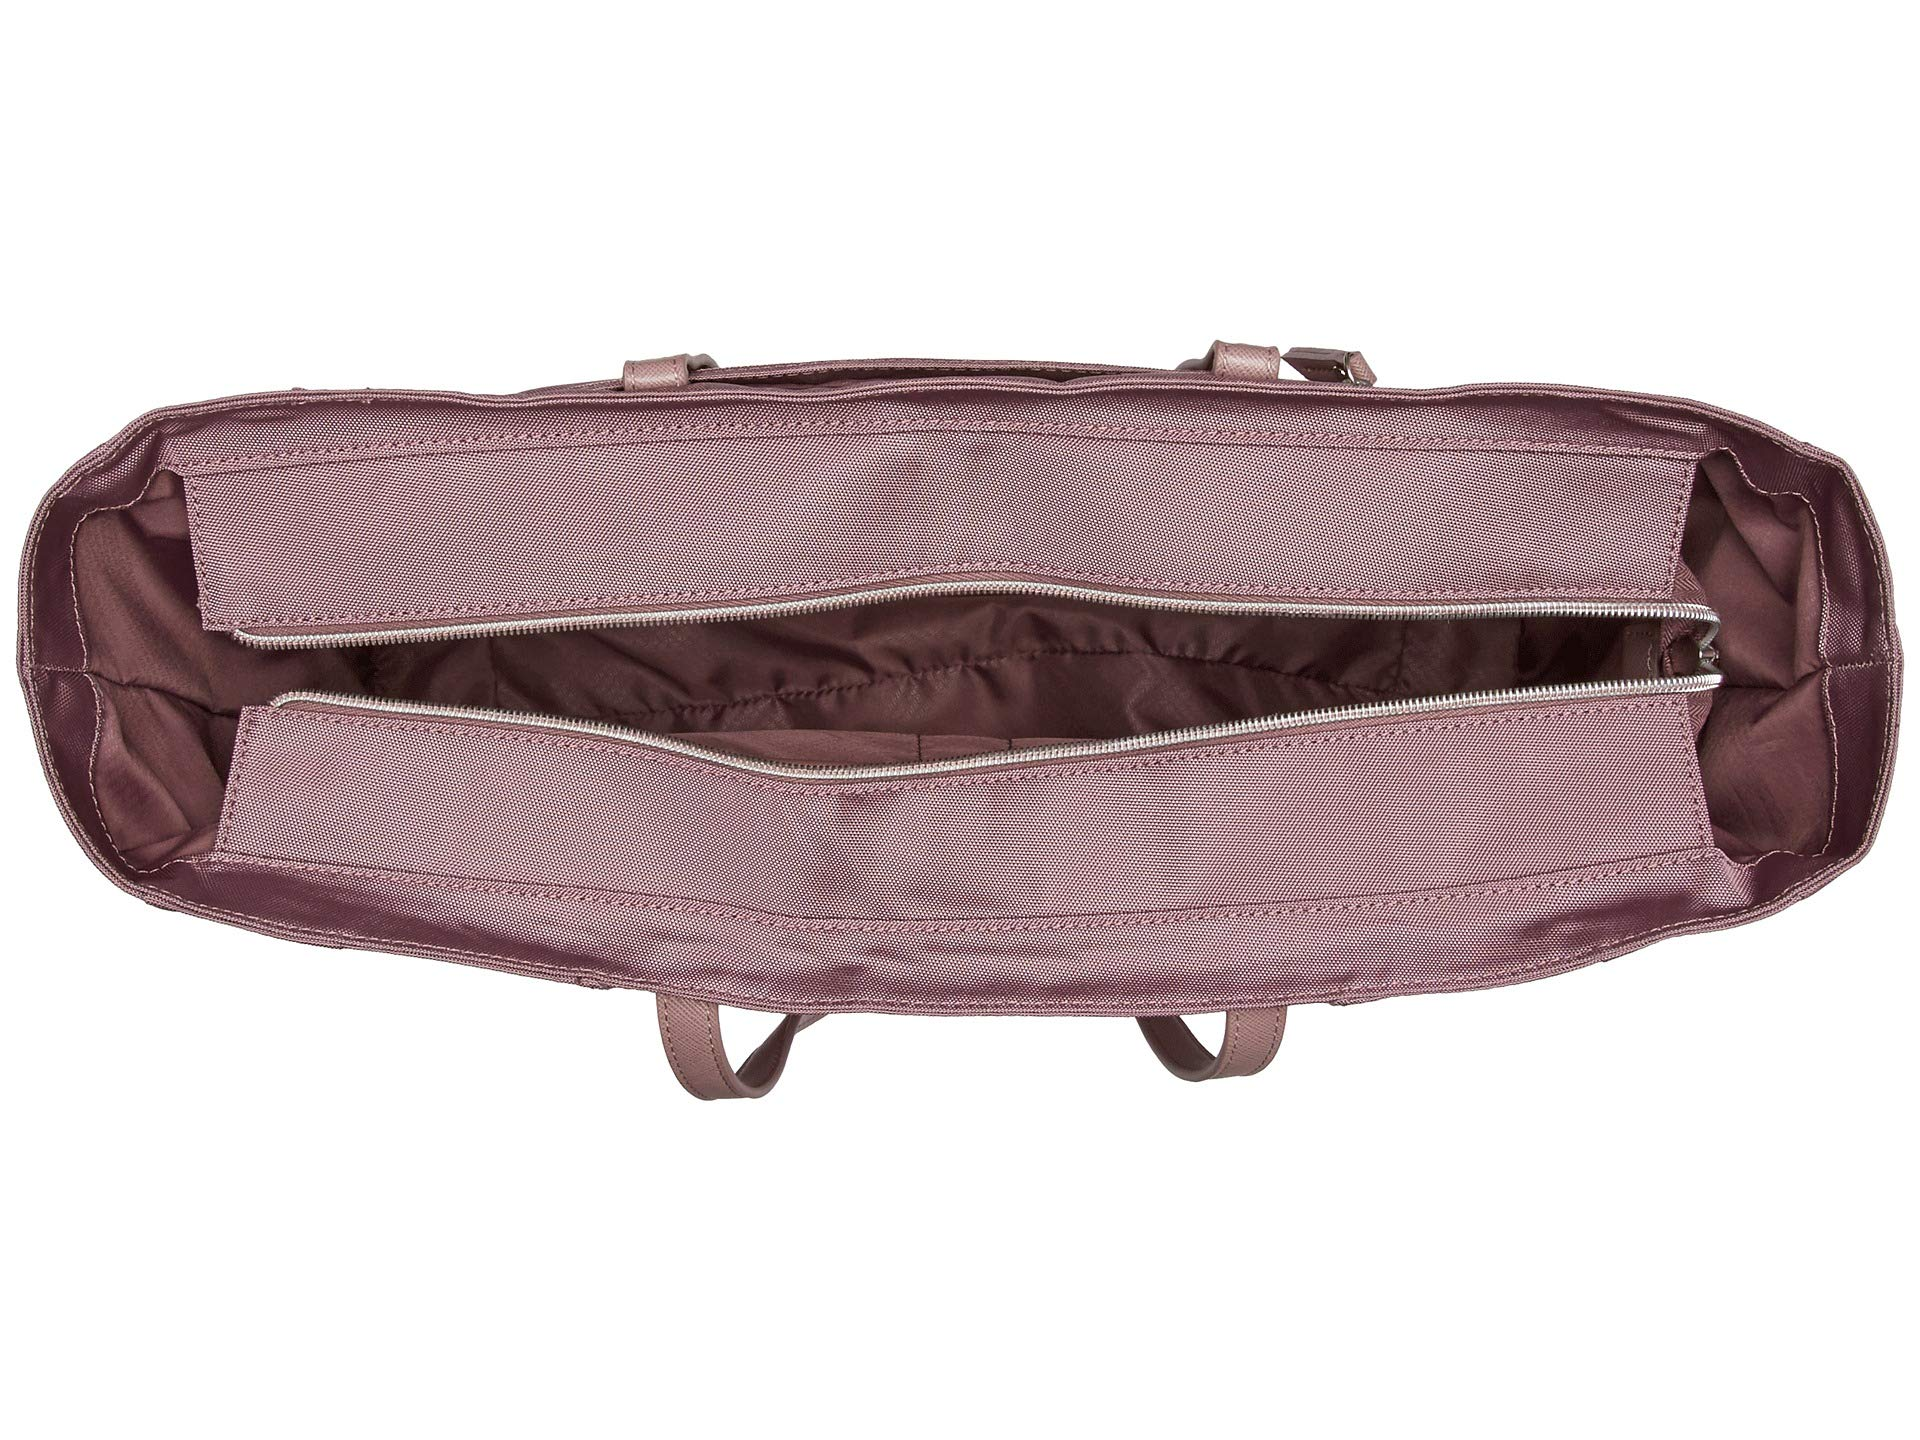 Dusty Maxlite® Travelpro Women's 5 Rose Tote 77FBf6Wq